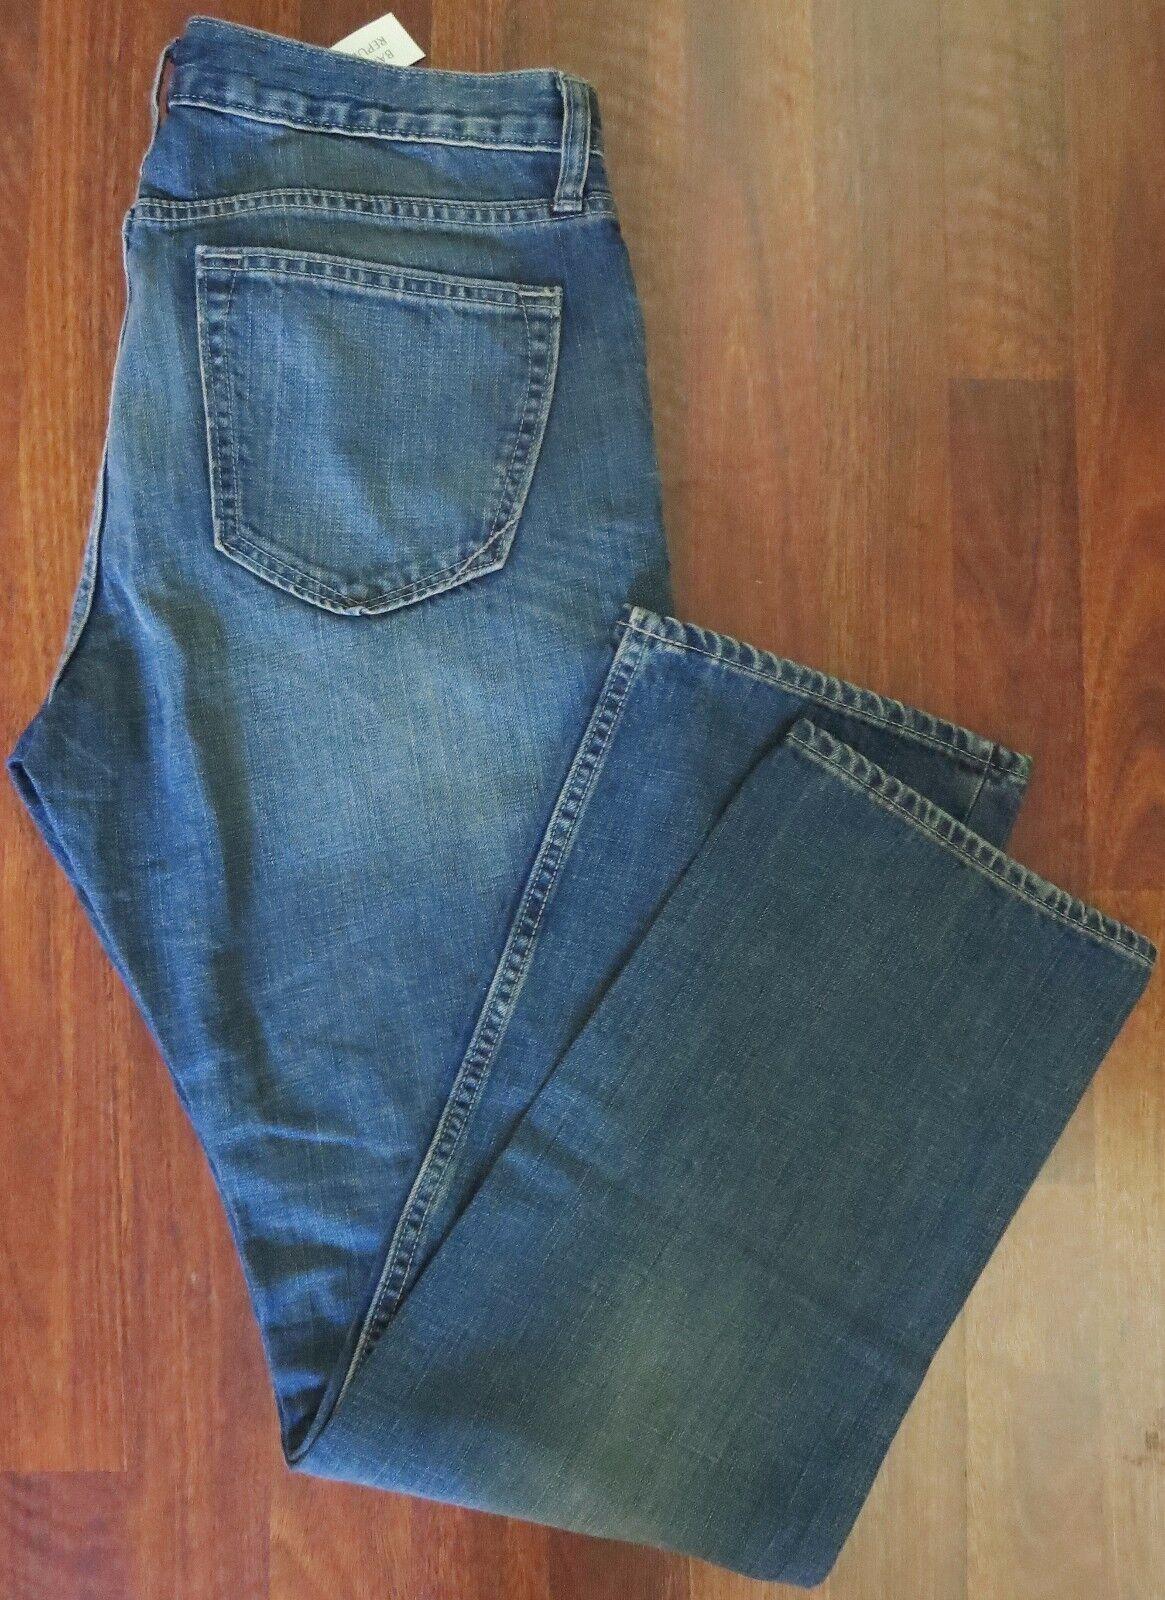 Banana Republic Jeans Jambe Hommes Droite Taille Hommes Jambe 32 X 32 Classique Délavé Lavage e043aa